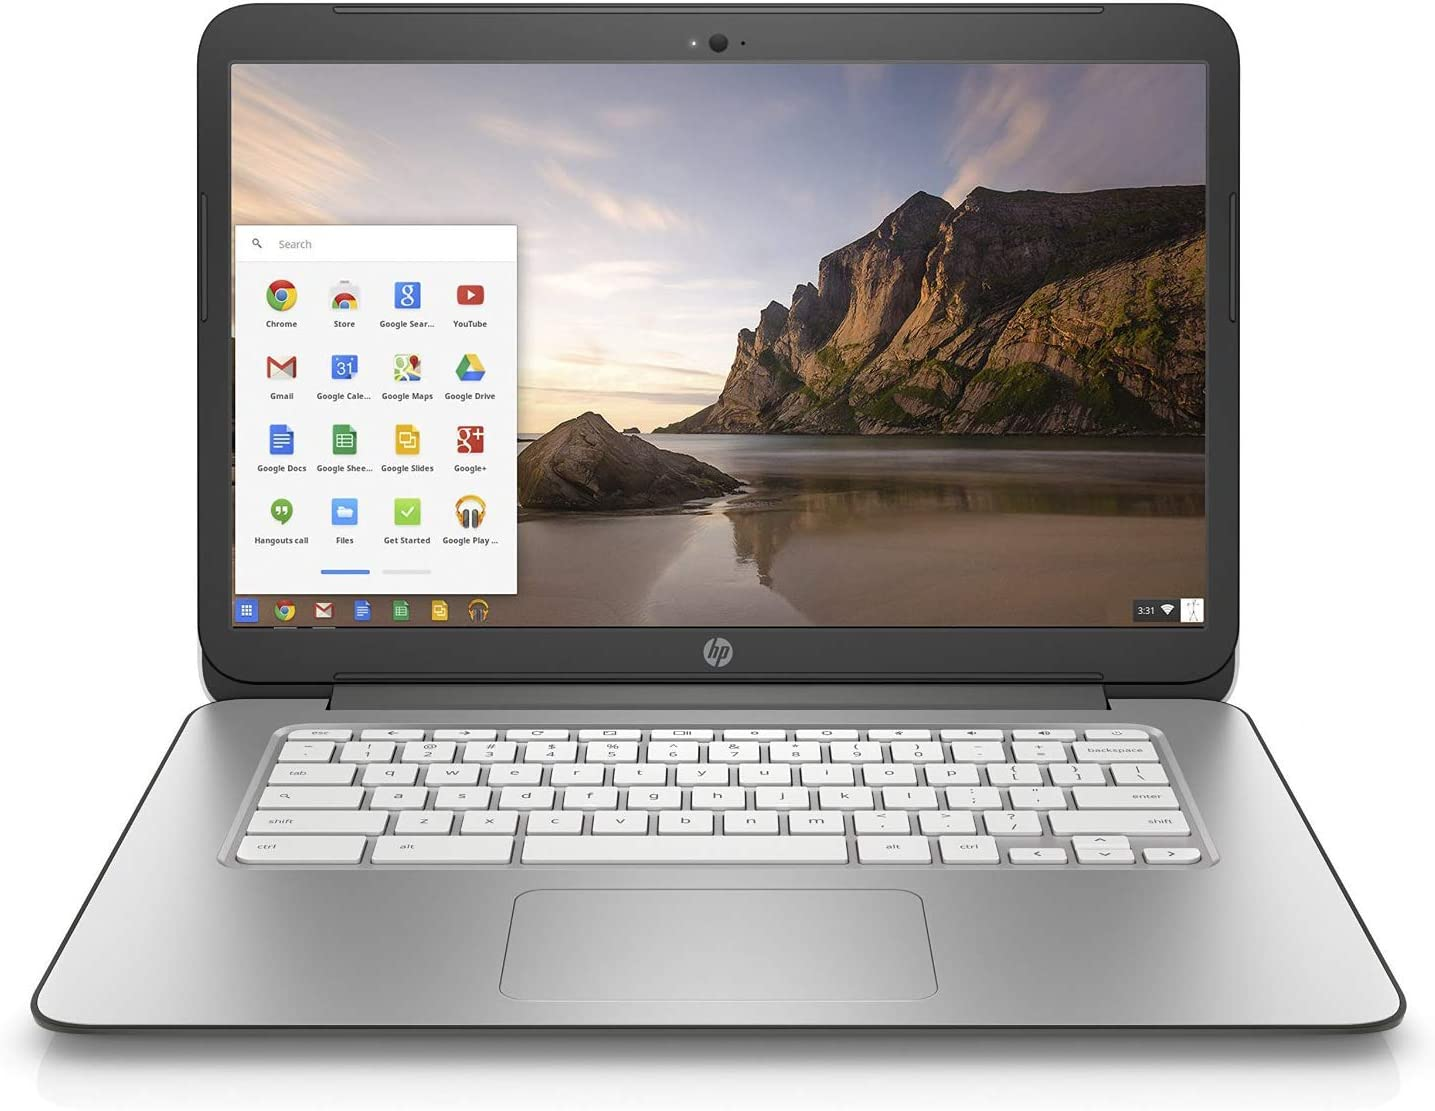 HP Chromebook 14 G3 K4K11UA - 14-inch Laptop, Quad-Core 2.10GHz, 4GB RAM, 16GB SSD, Black (Renewed)